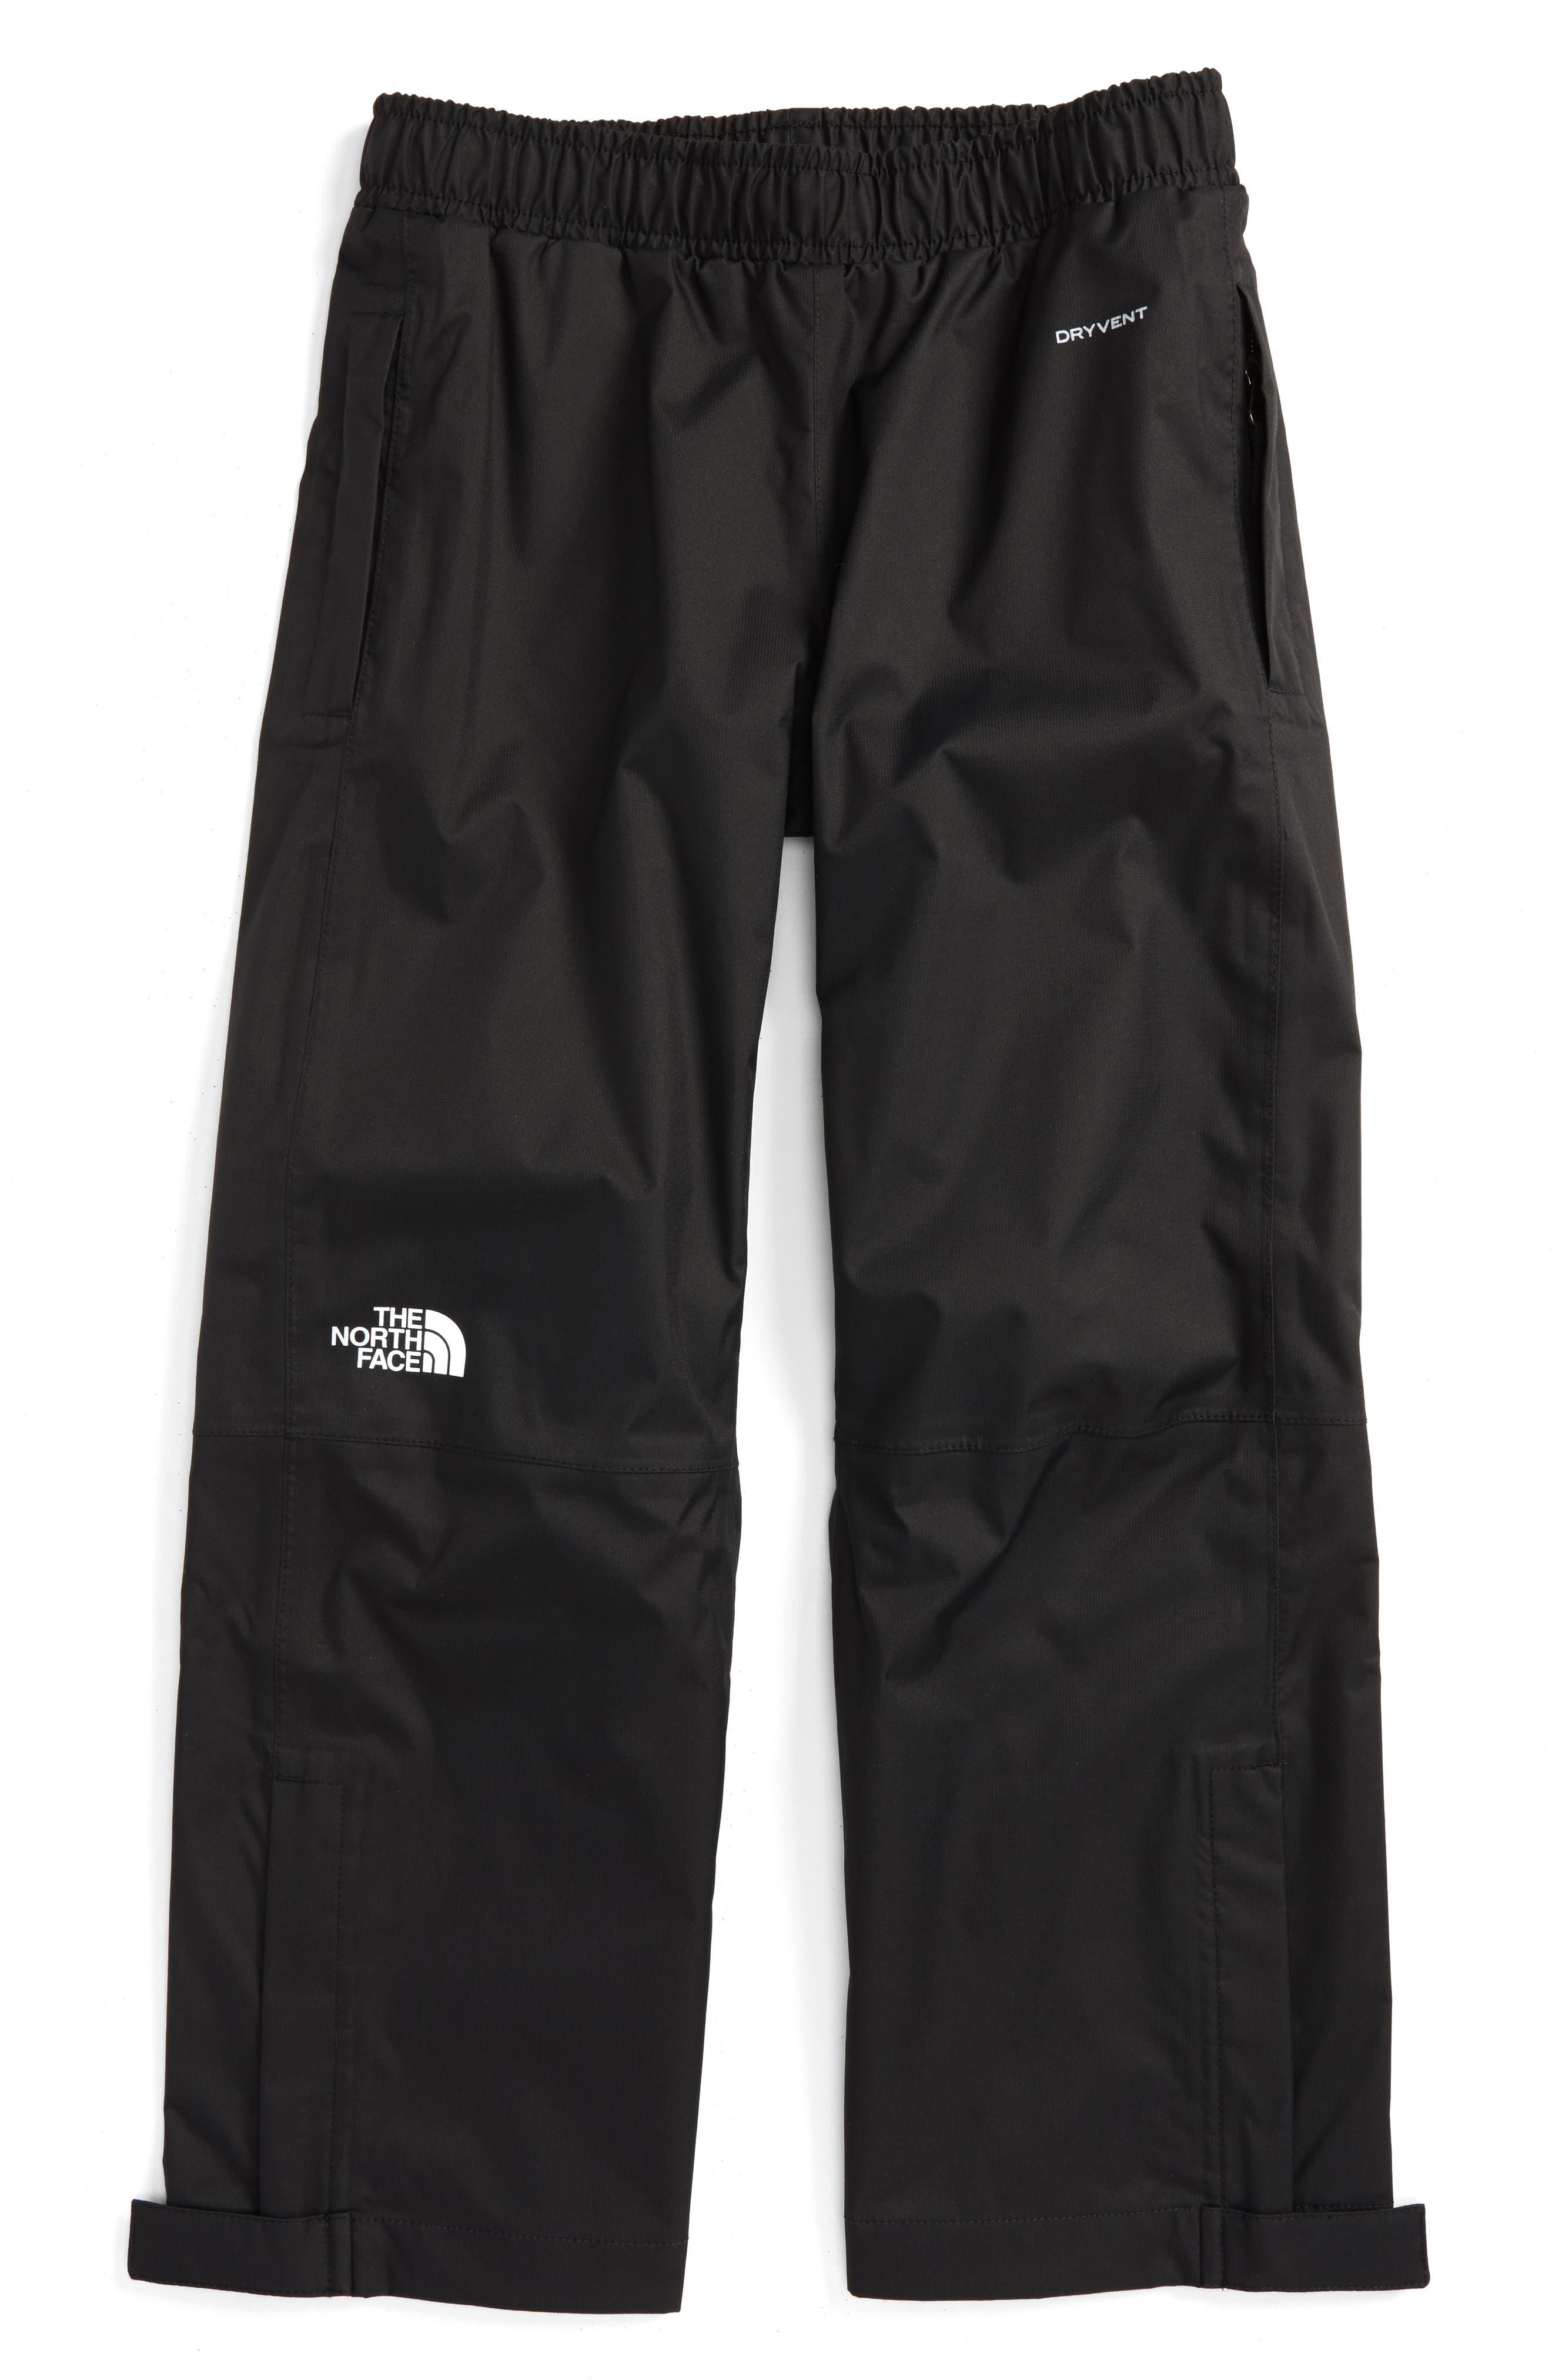 Alternate Image 1 Selected - The North Face 'Resolve' Waterproof Rain Pants (Little Boys)